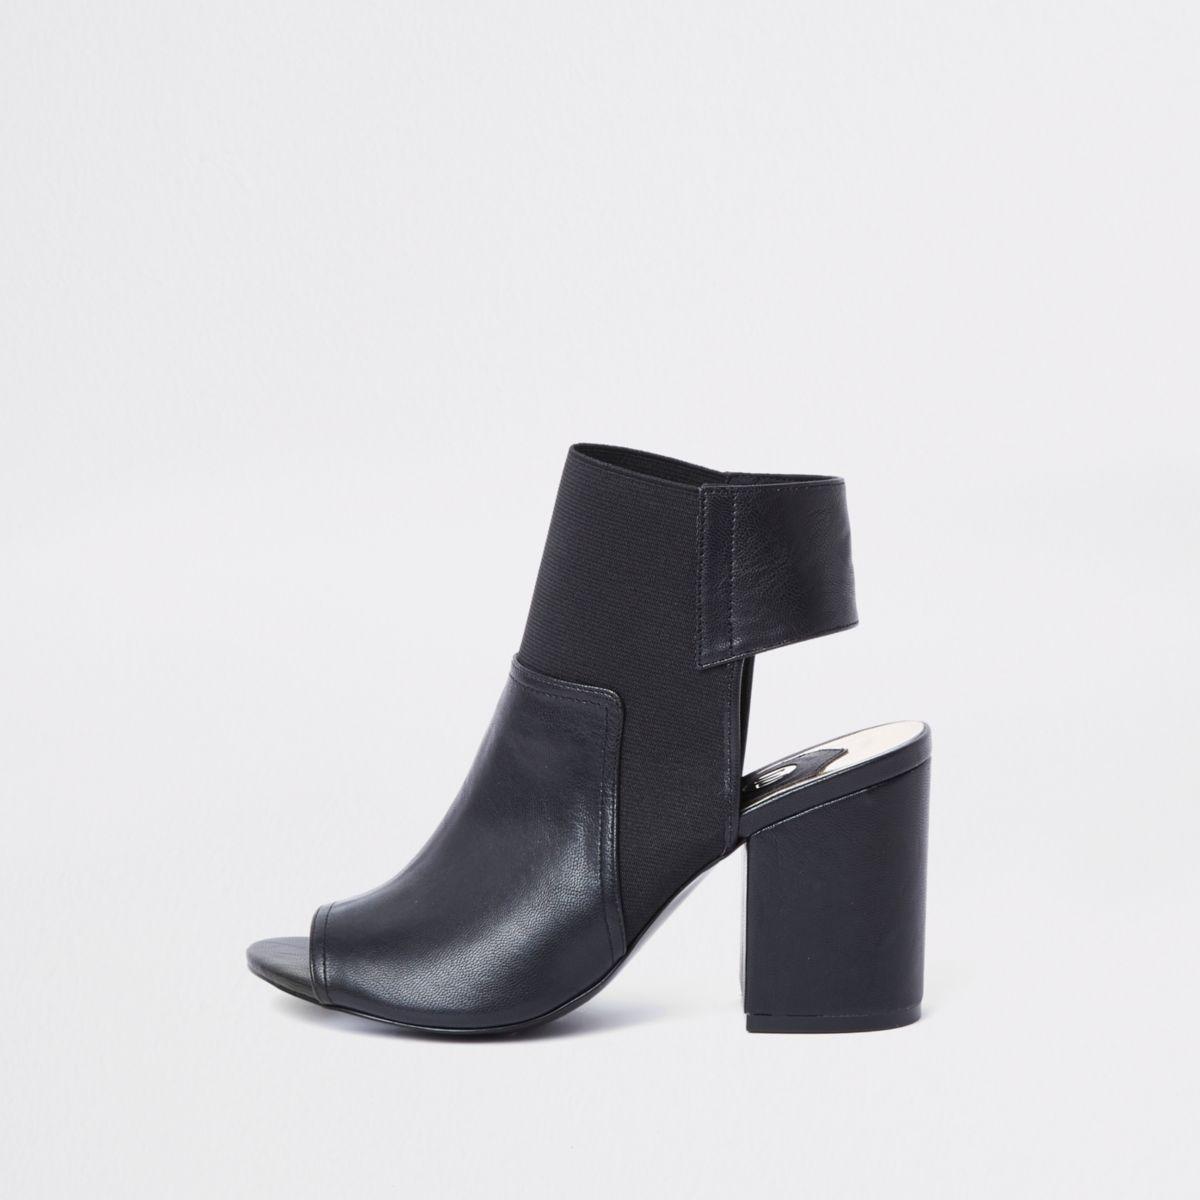 Black faux leather block heel shoe boots